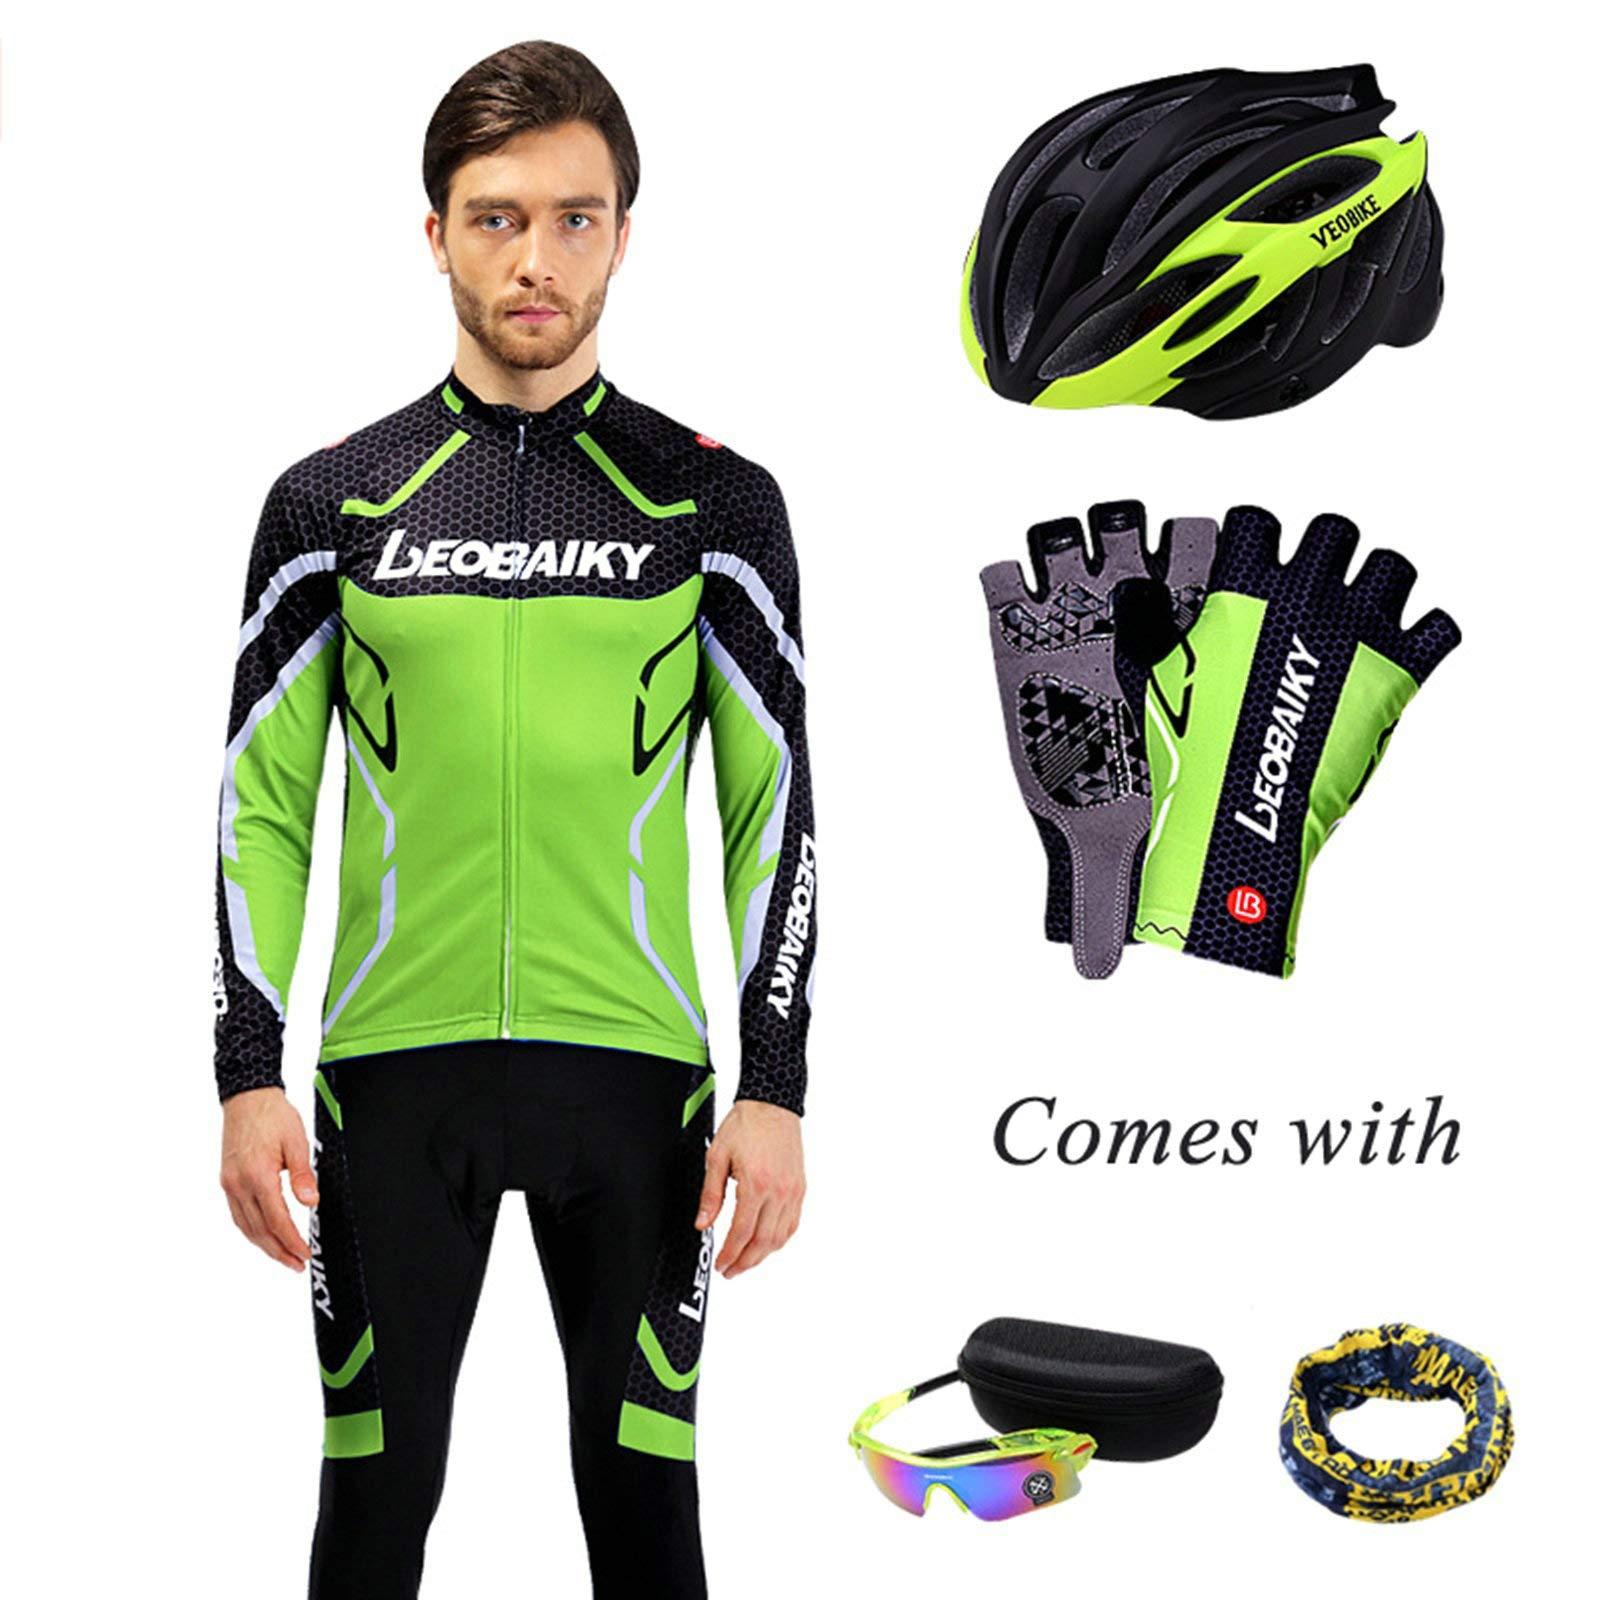 Aooaz Men's Biking Clothing Set Shirt Leggings with Helmet/Gloves/Goggles/Mask Green S